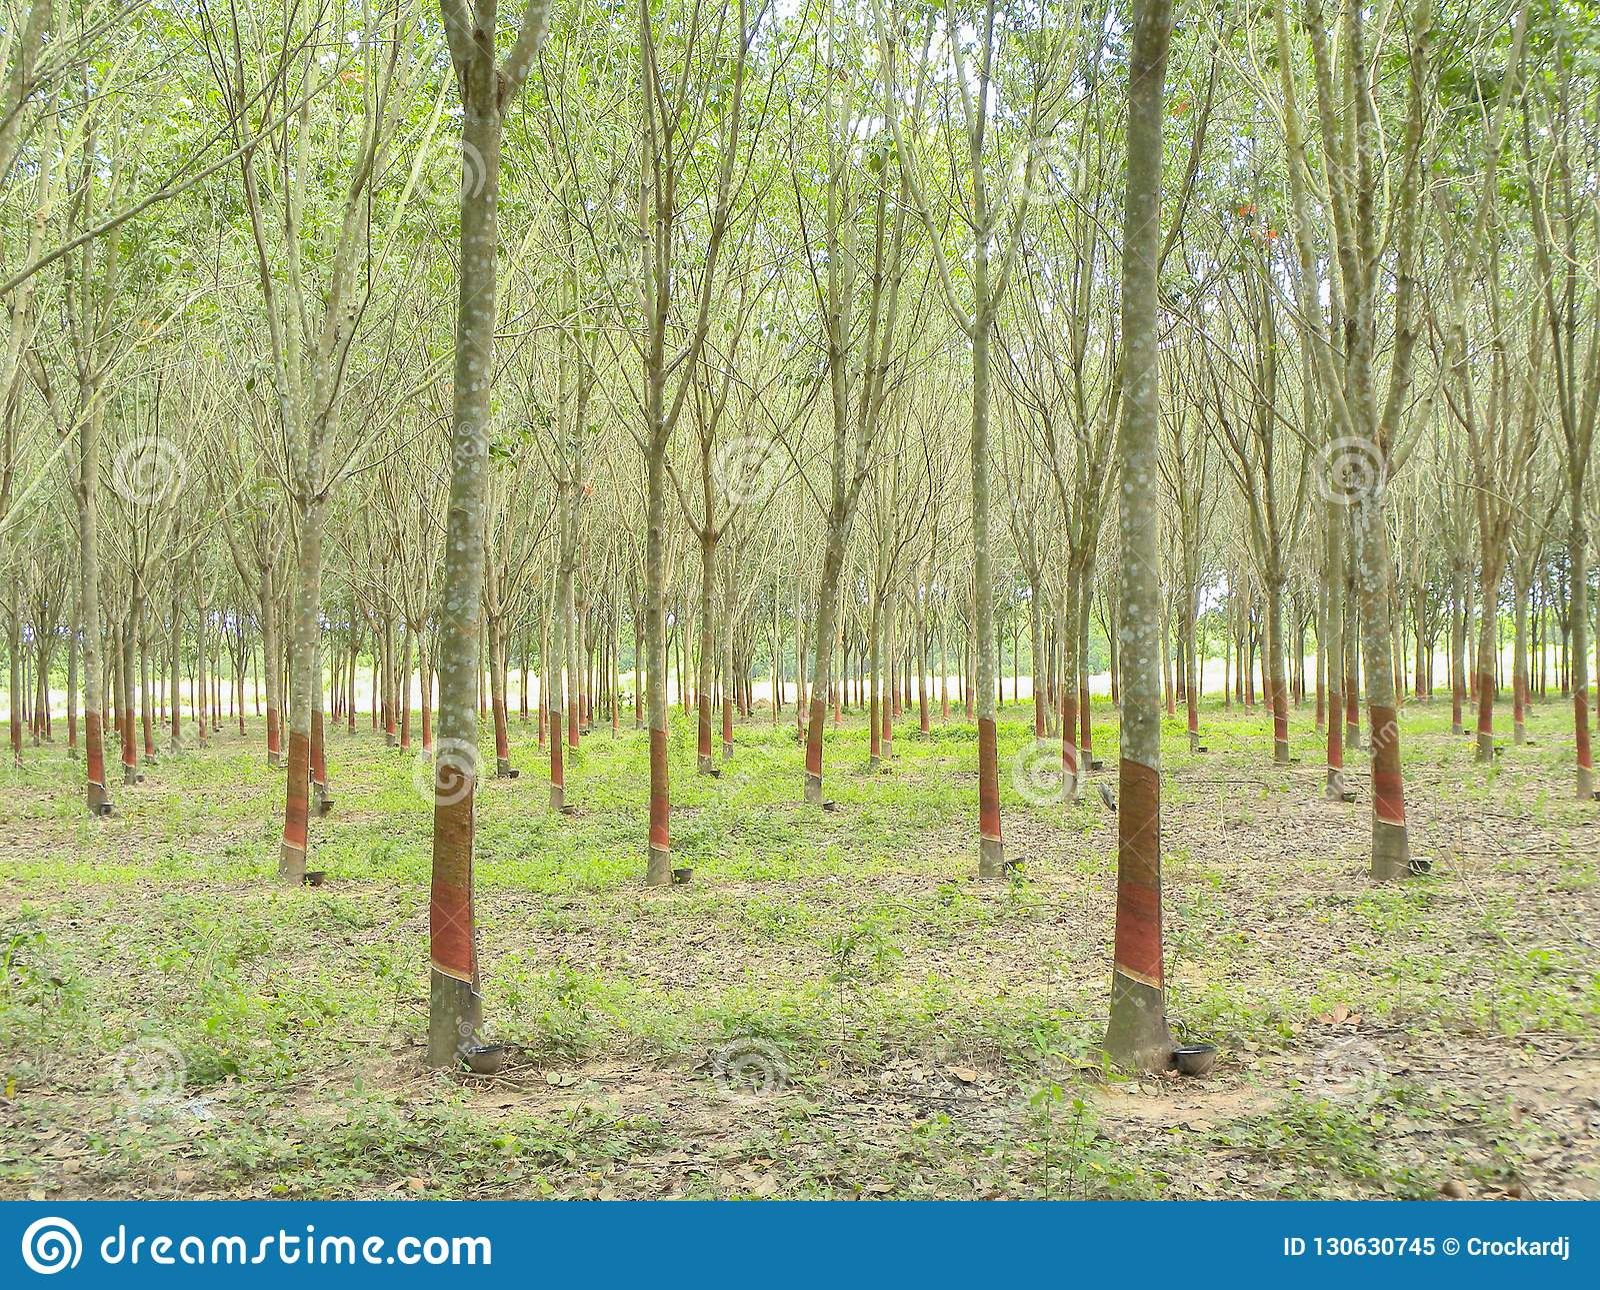 Ноябрь 2017 - Chachoengsao, Таиланд - роща резиновых будучи сжатым деревьев